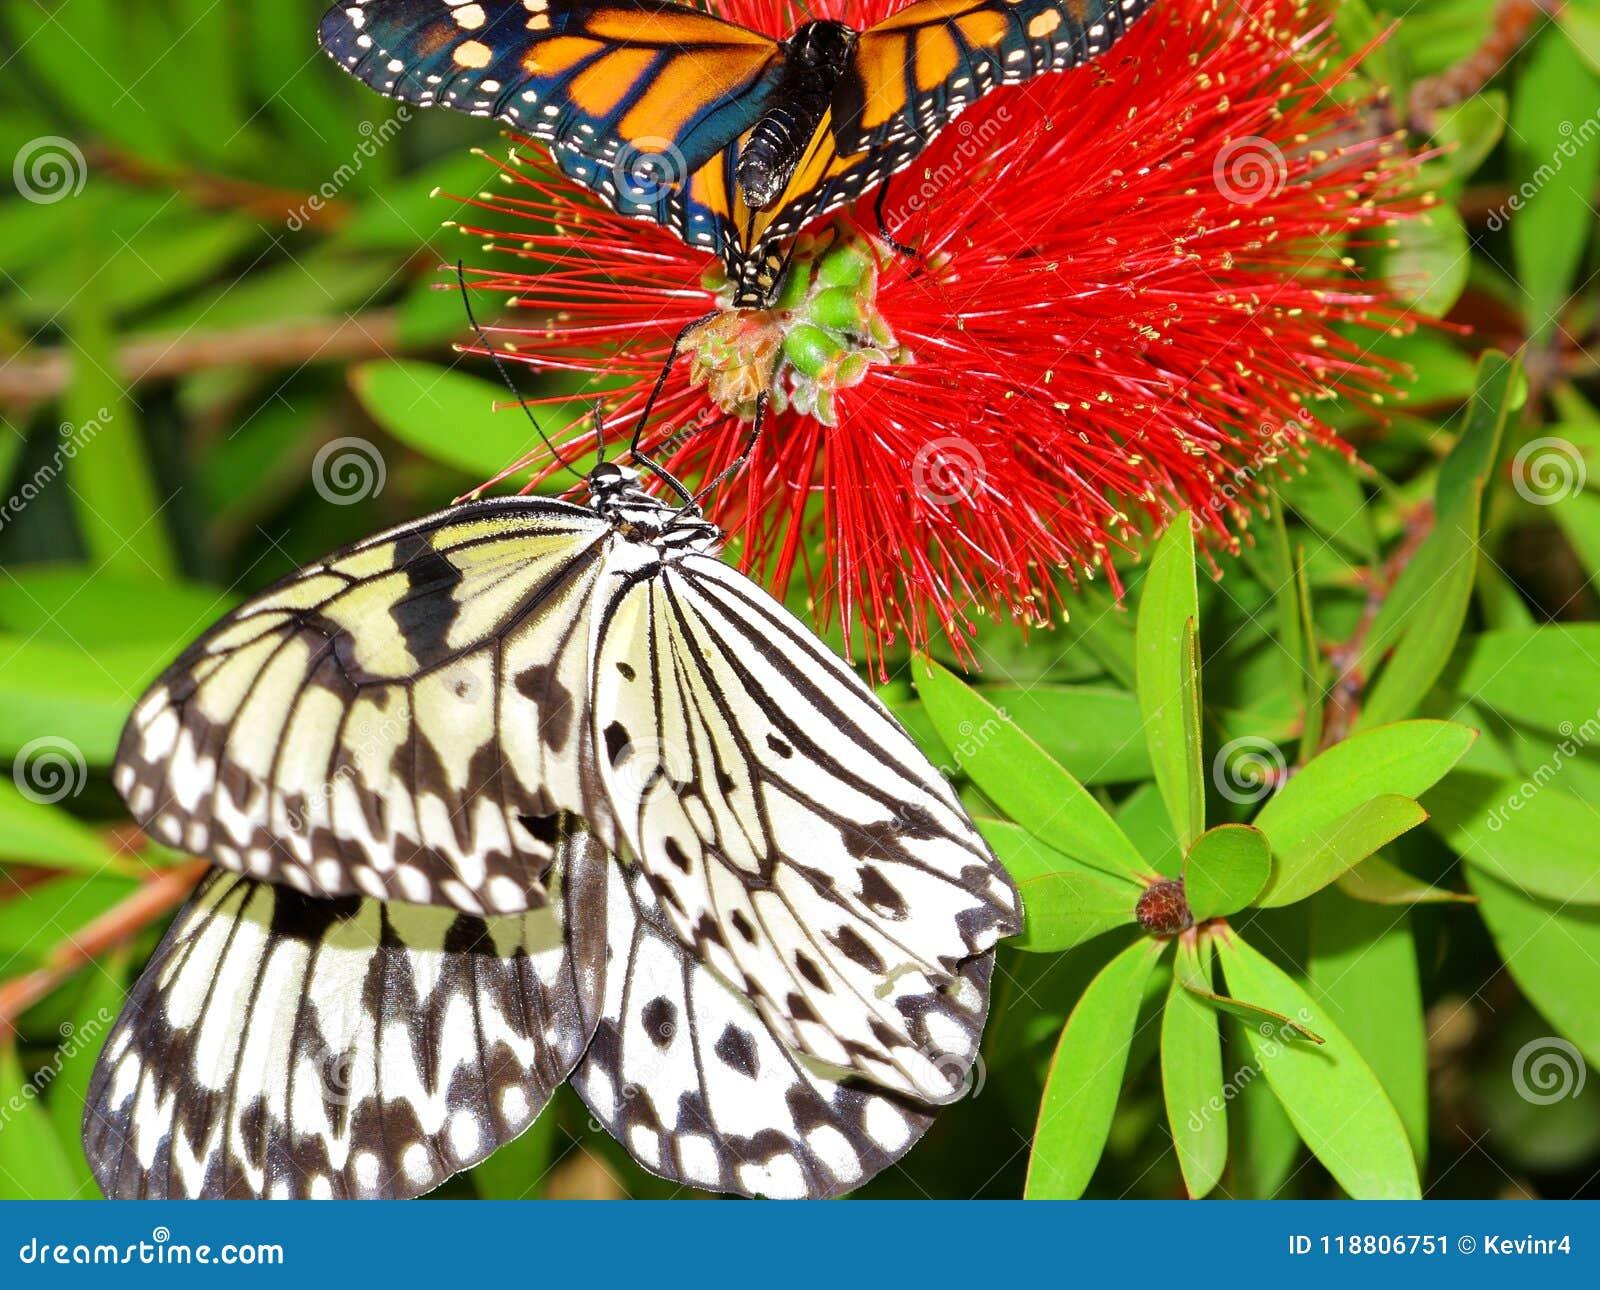 The Beautiful Butterflies Idea Leuconoe Danaus Resting On Pretty